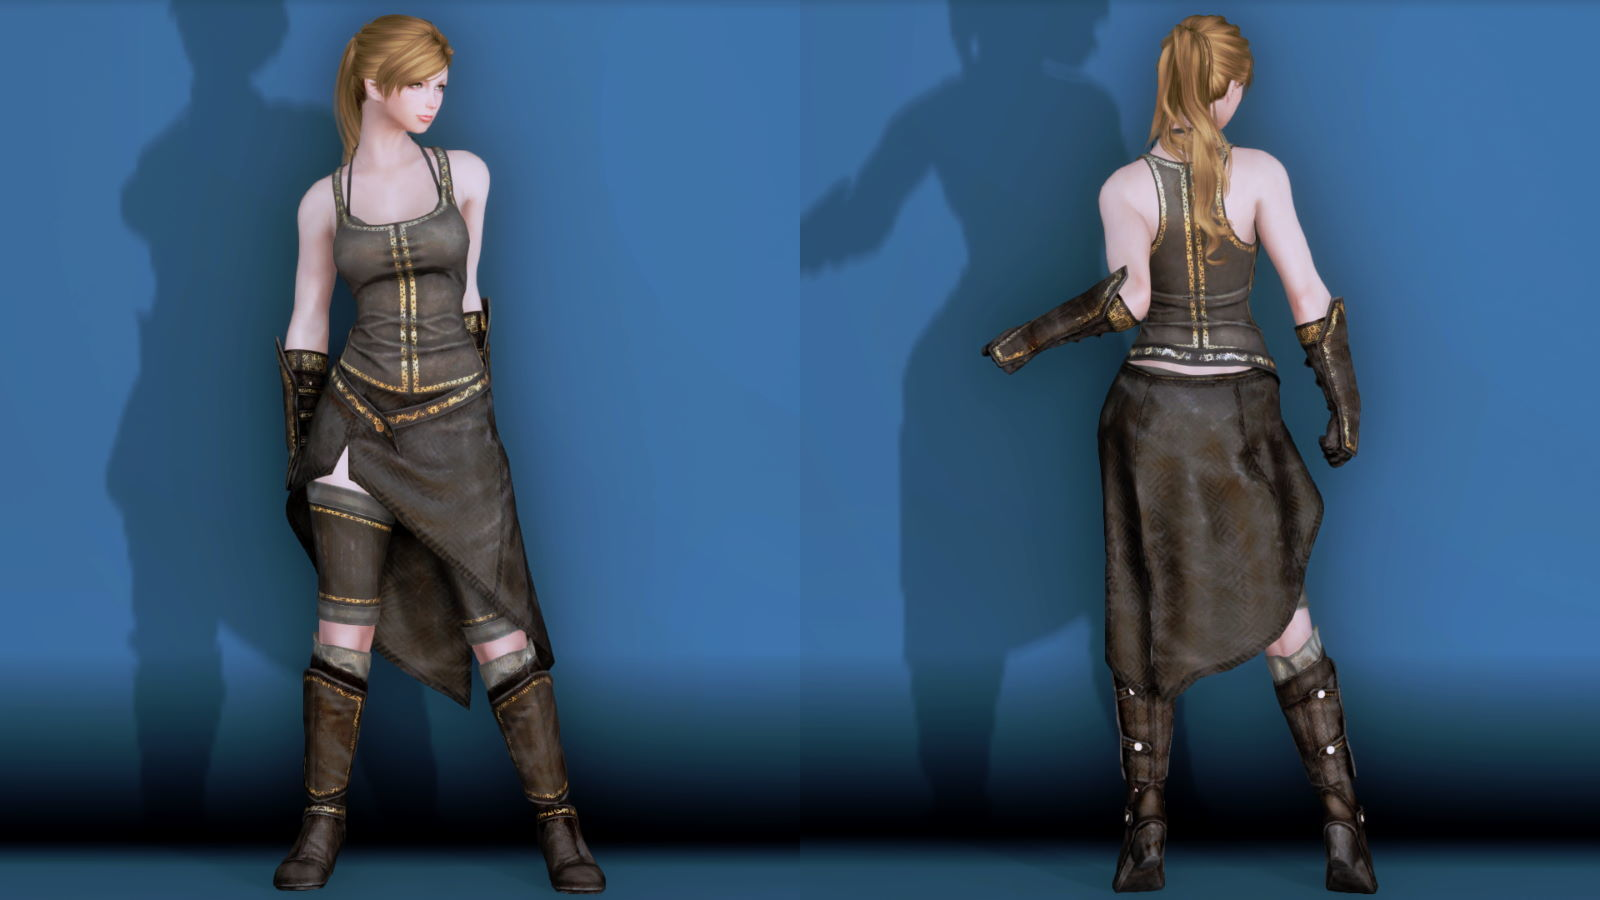 RuggedRogueSSE 221-1 Pose Fu-Ba-F Vest Skirt W 2